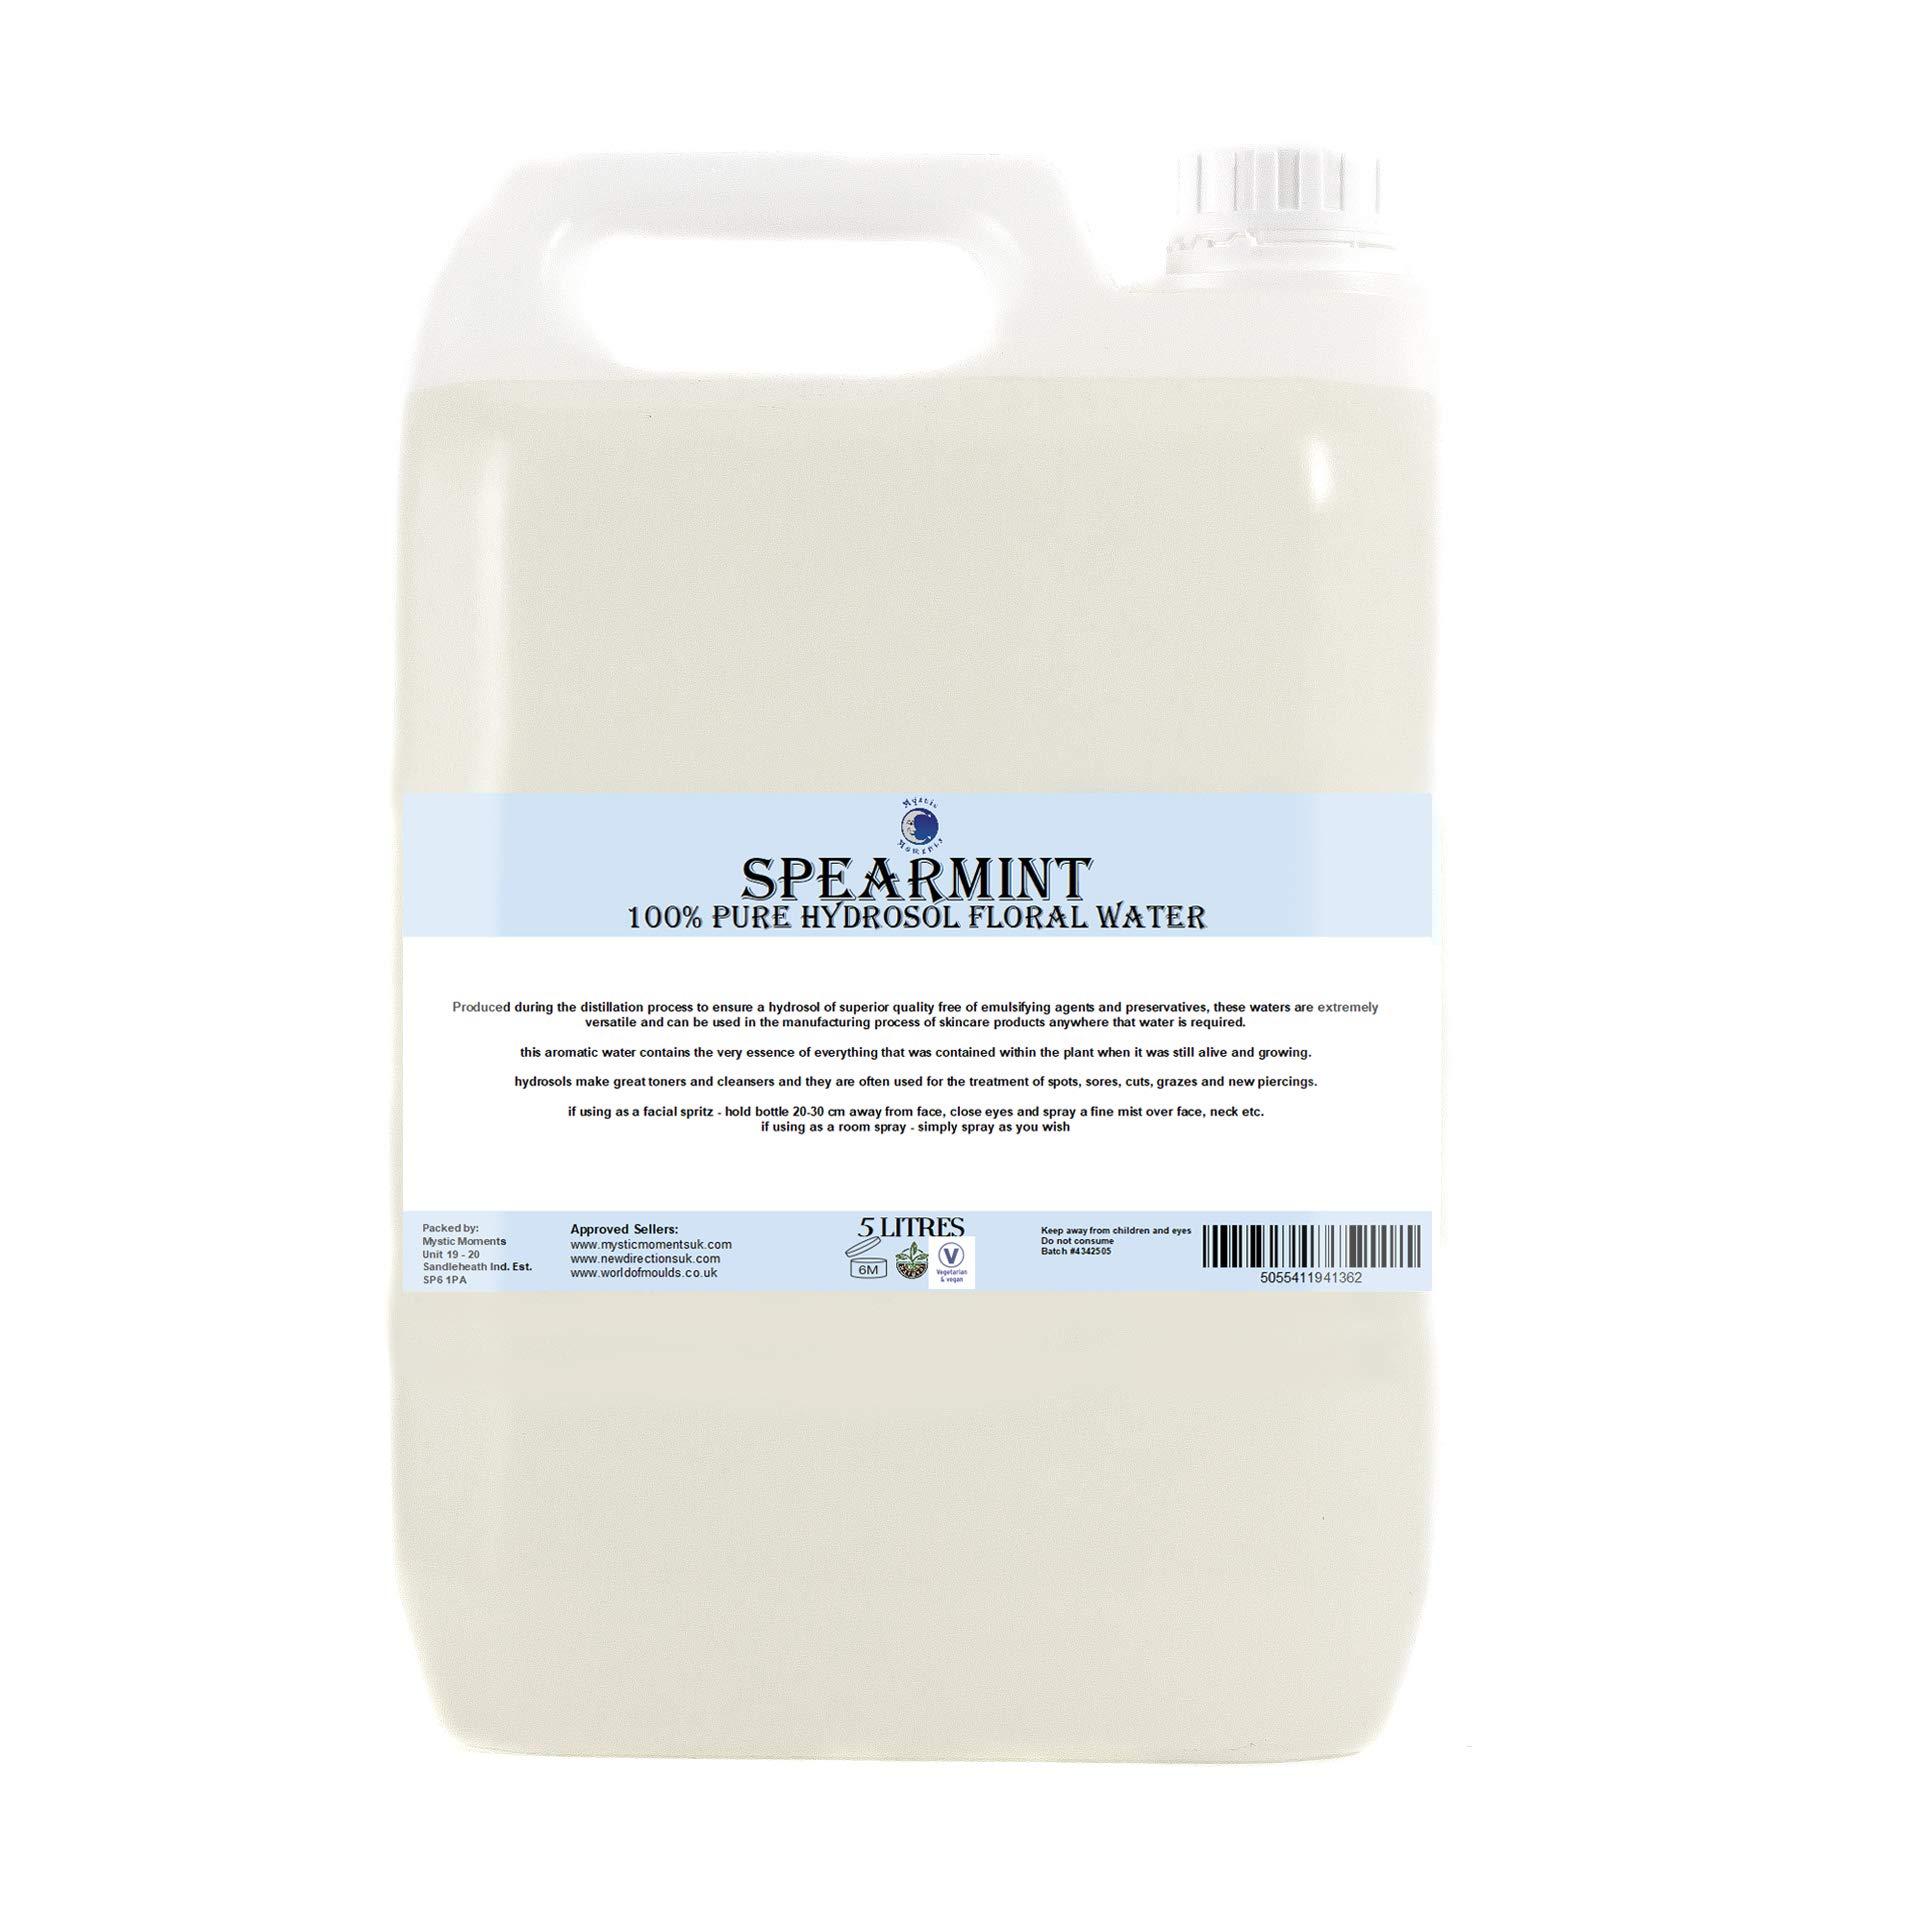 Spearmint Hydrosol Floral Water - 5Kg by BiOrigins (Image #1)